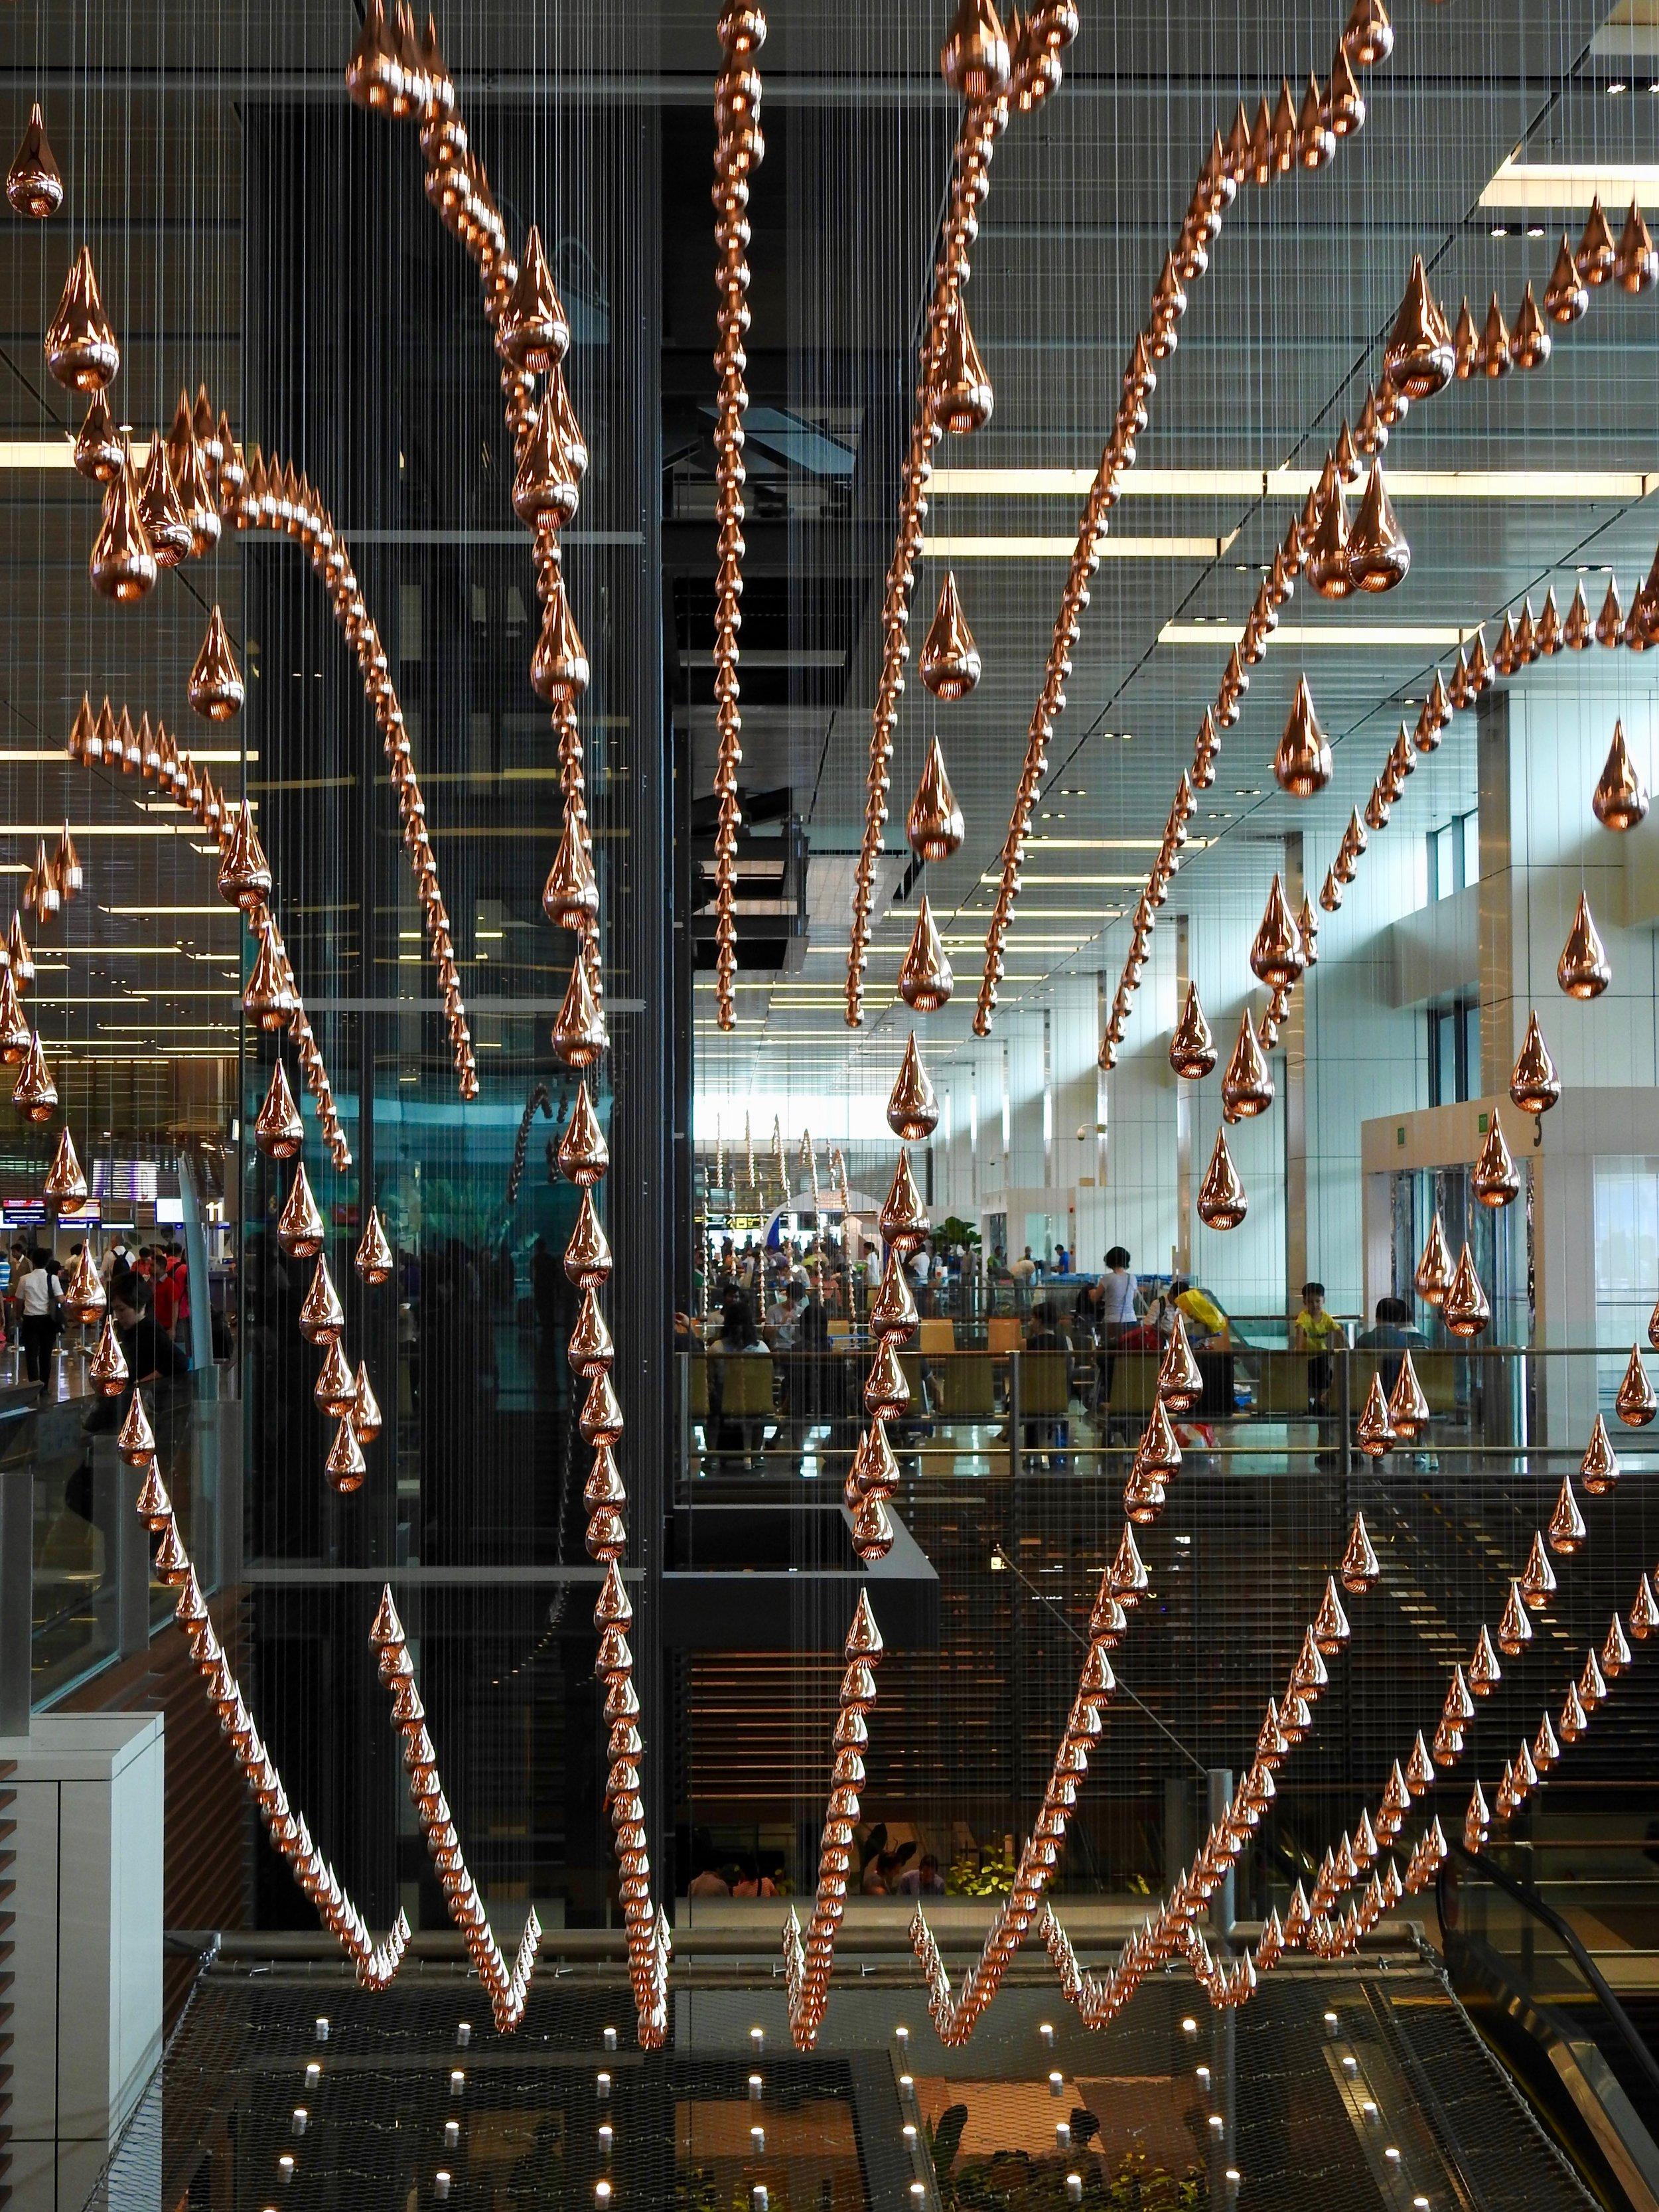 Changi Airport Terminal 1, Singapore. Photo: (C) Remko Tanis